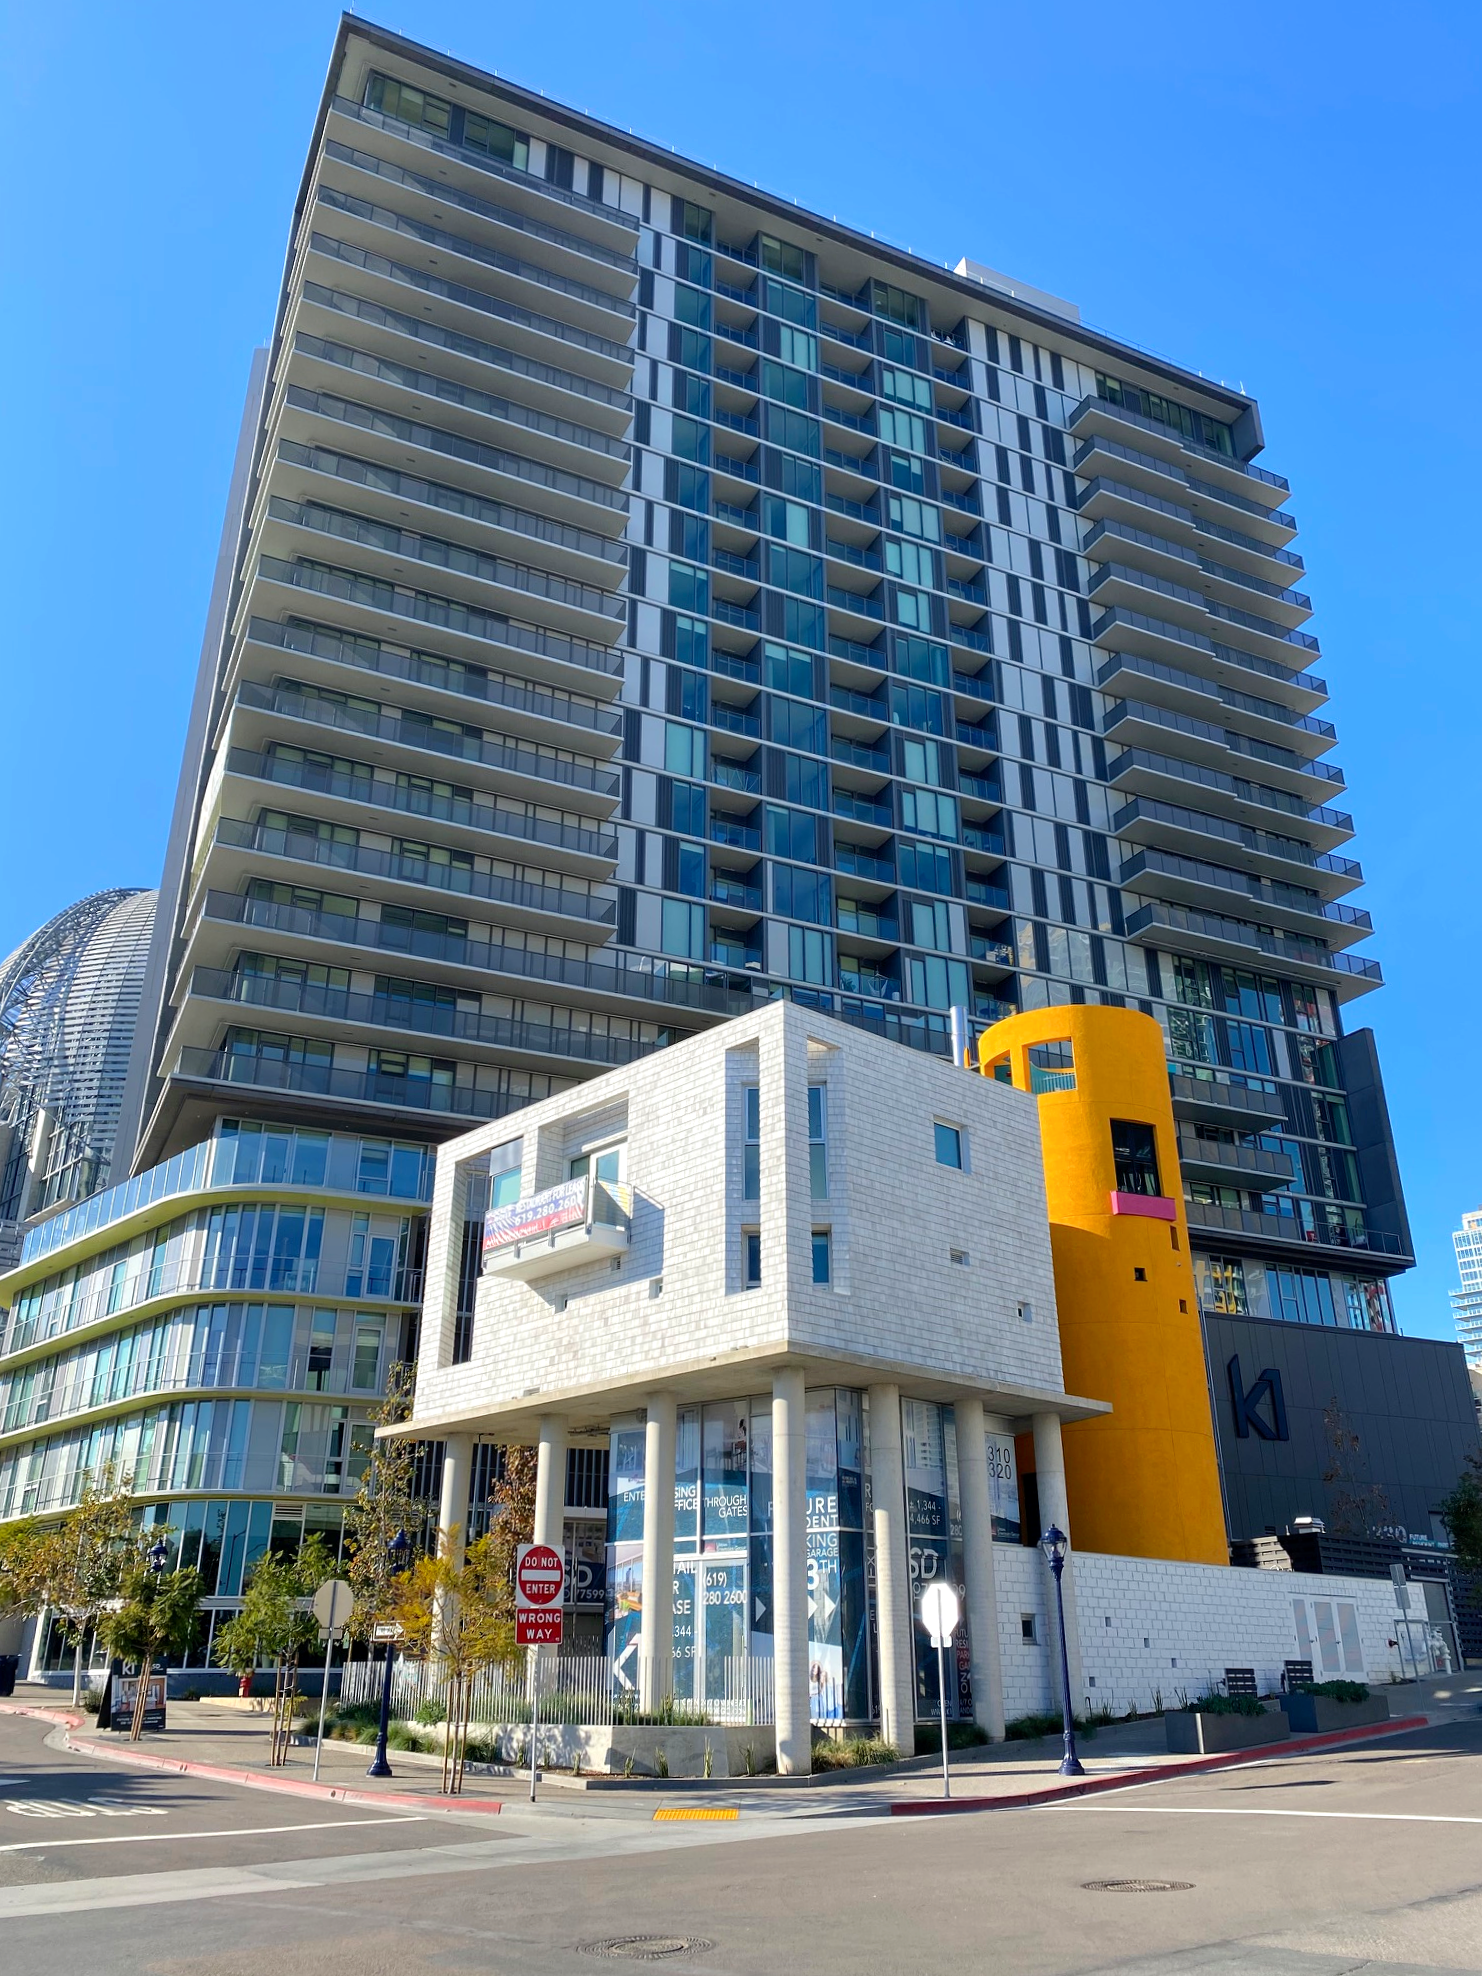 K1 Apartments